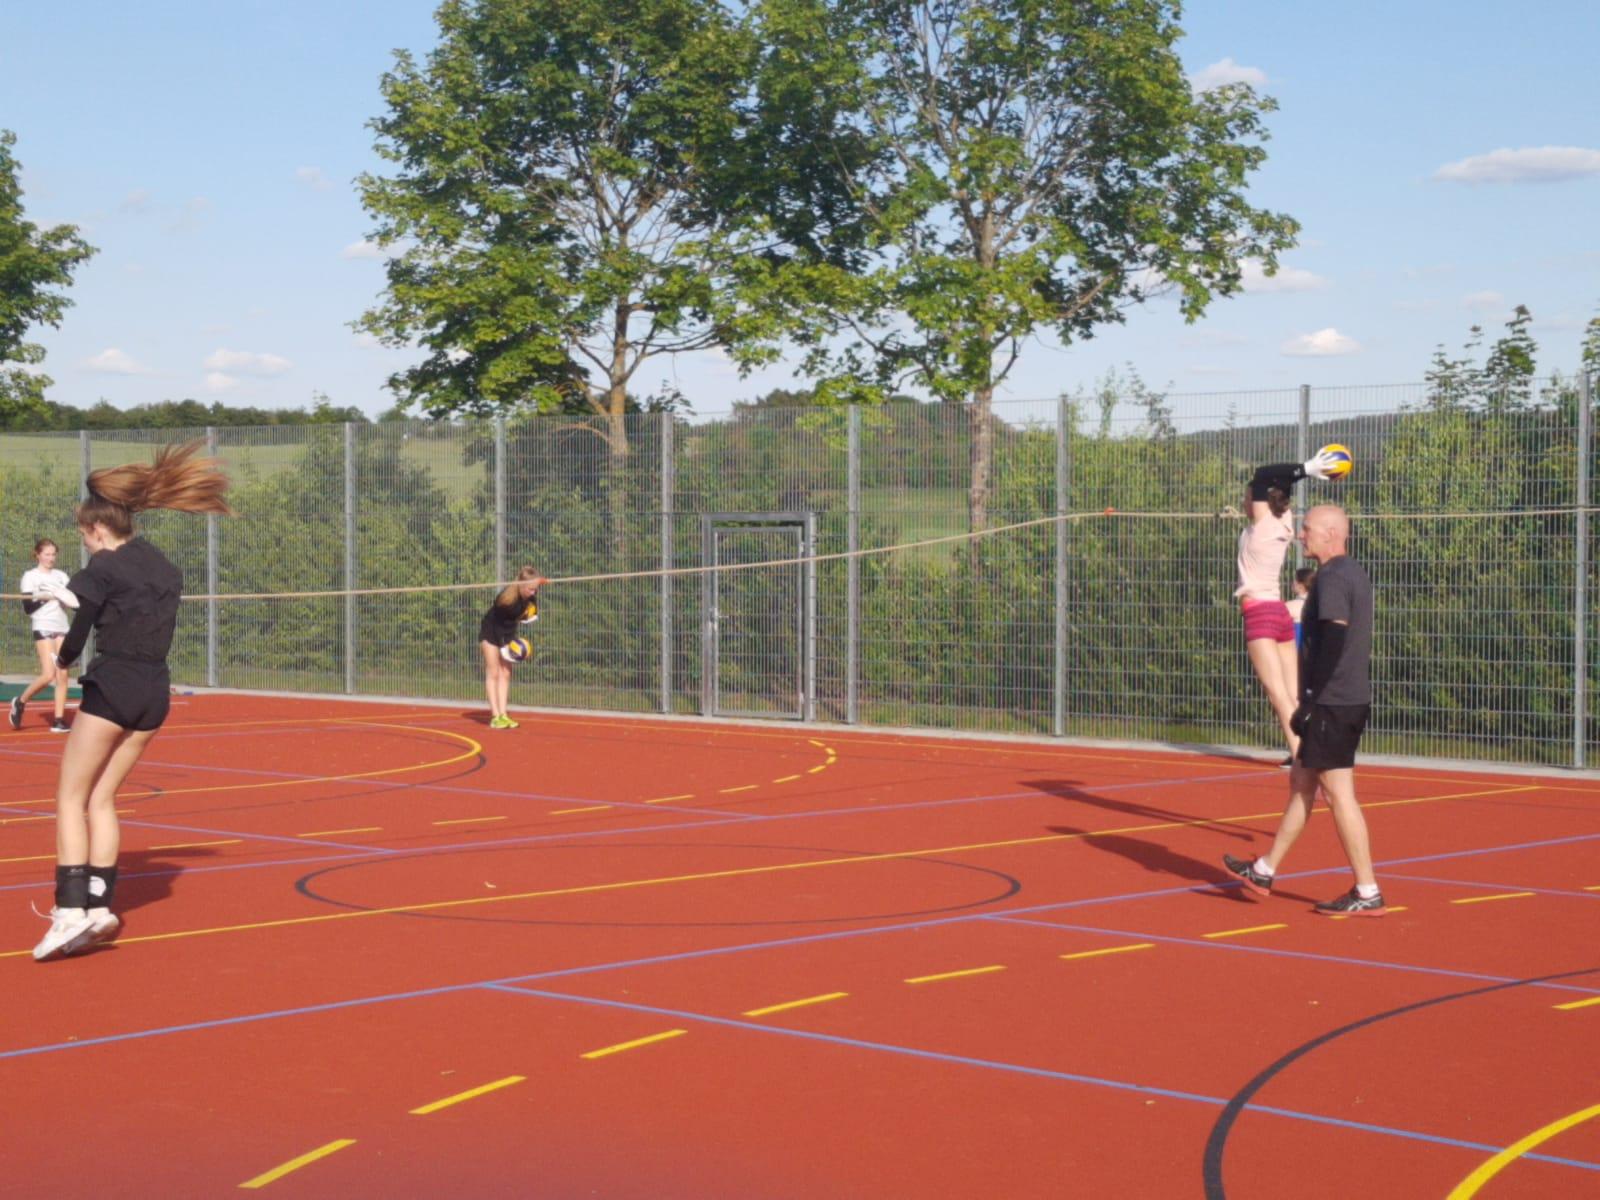 20200605_Volleyballdamen_Trainingsbeginn03